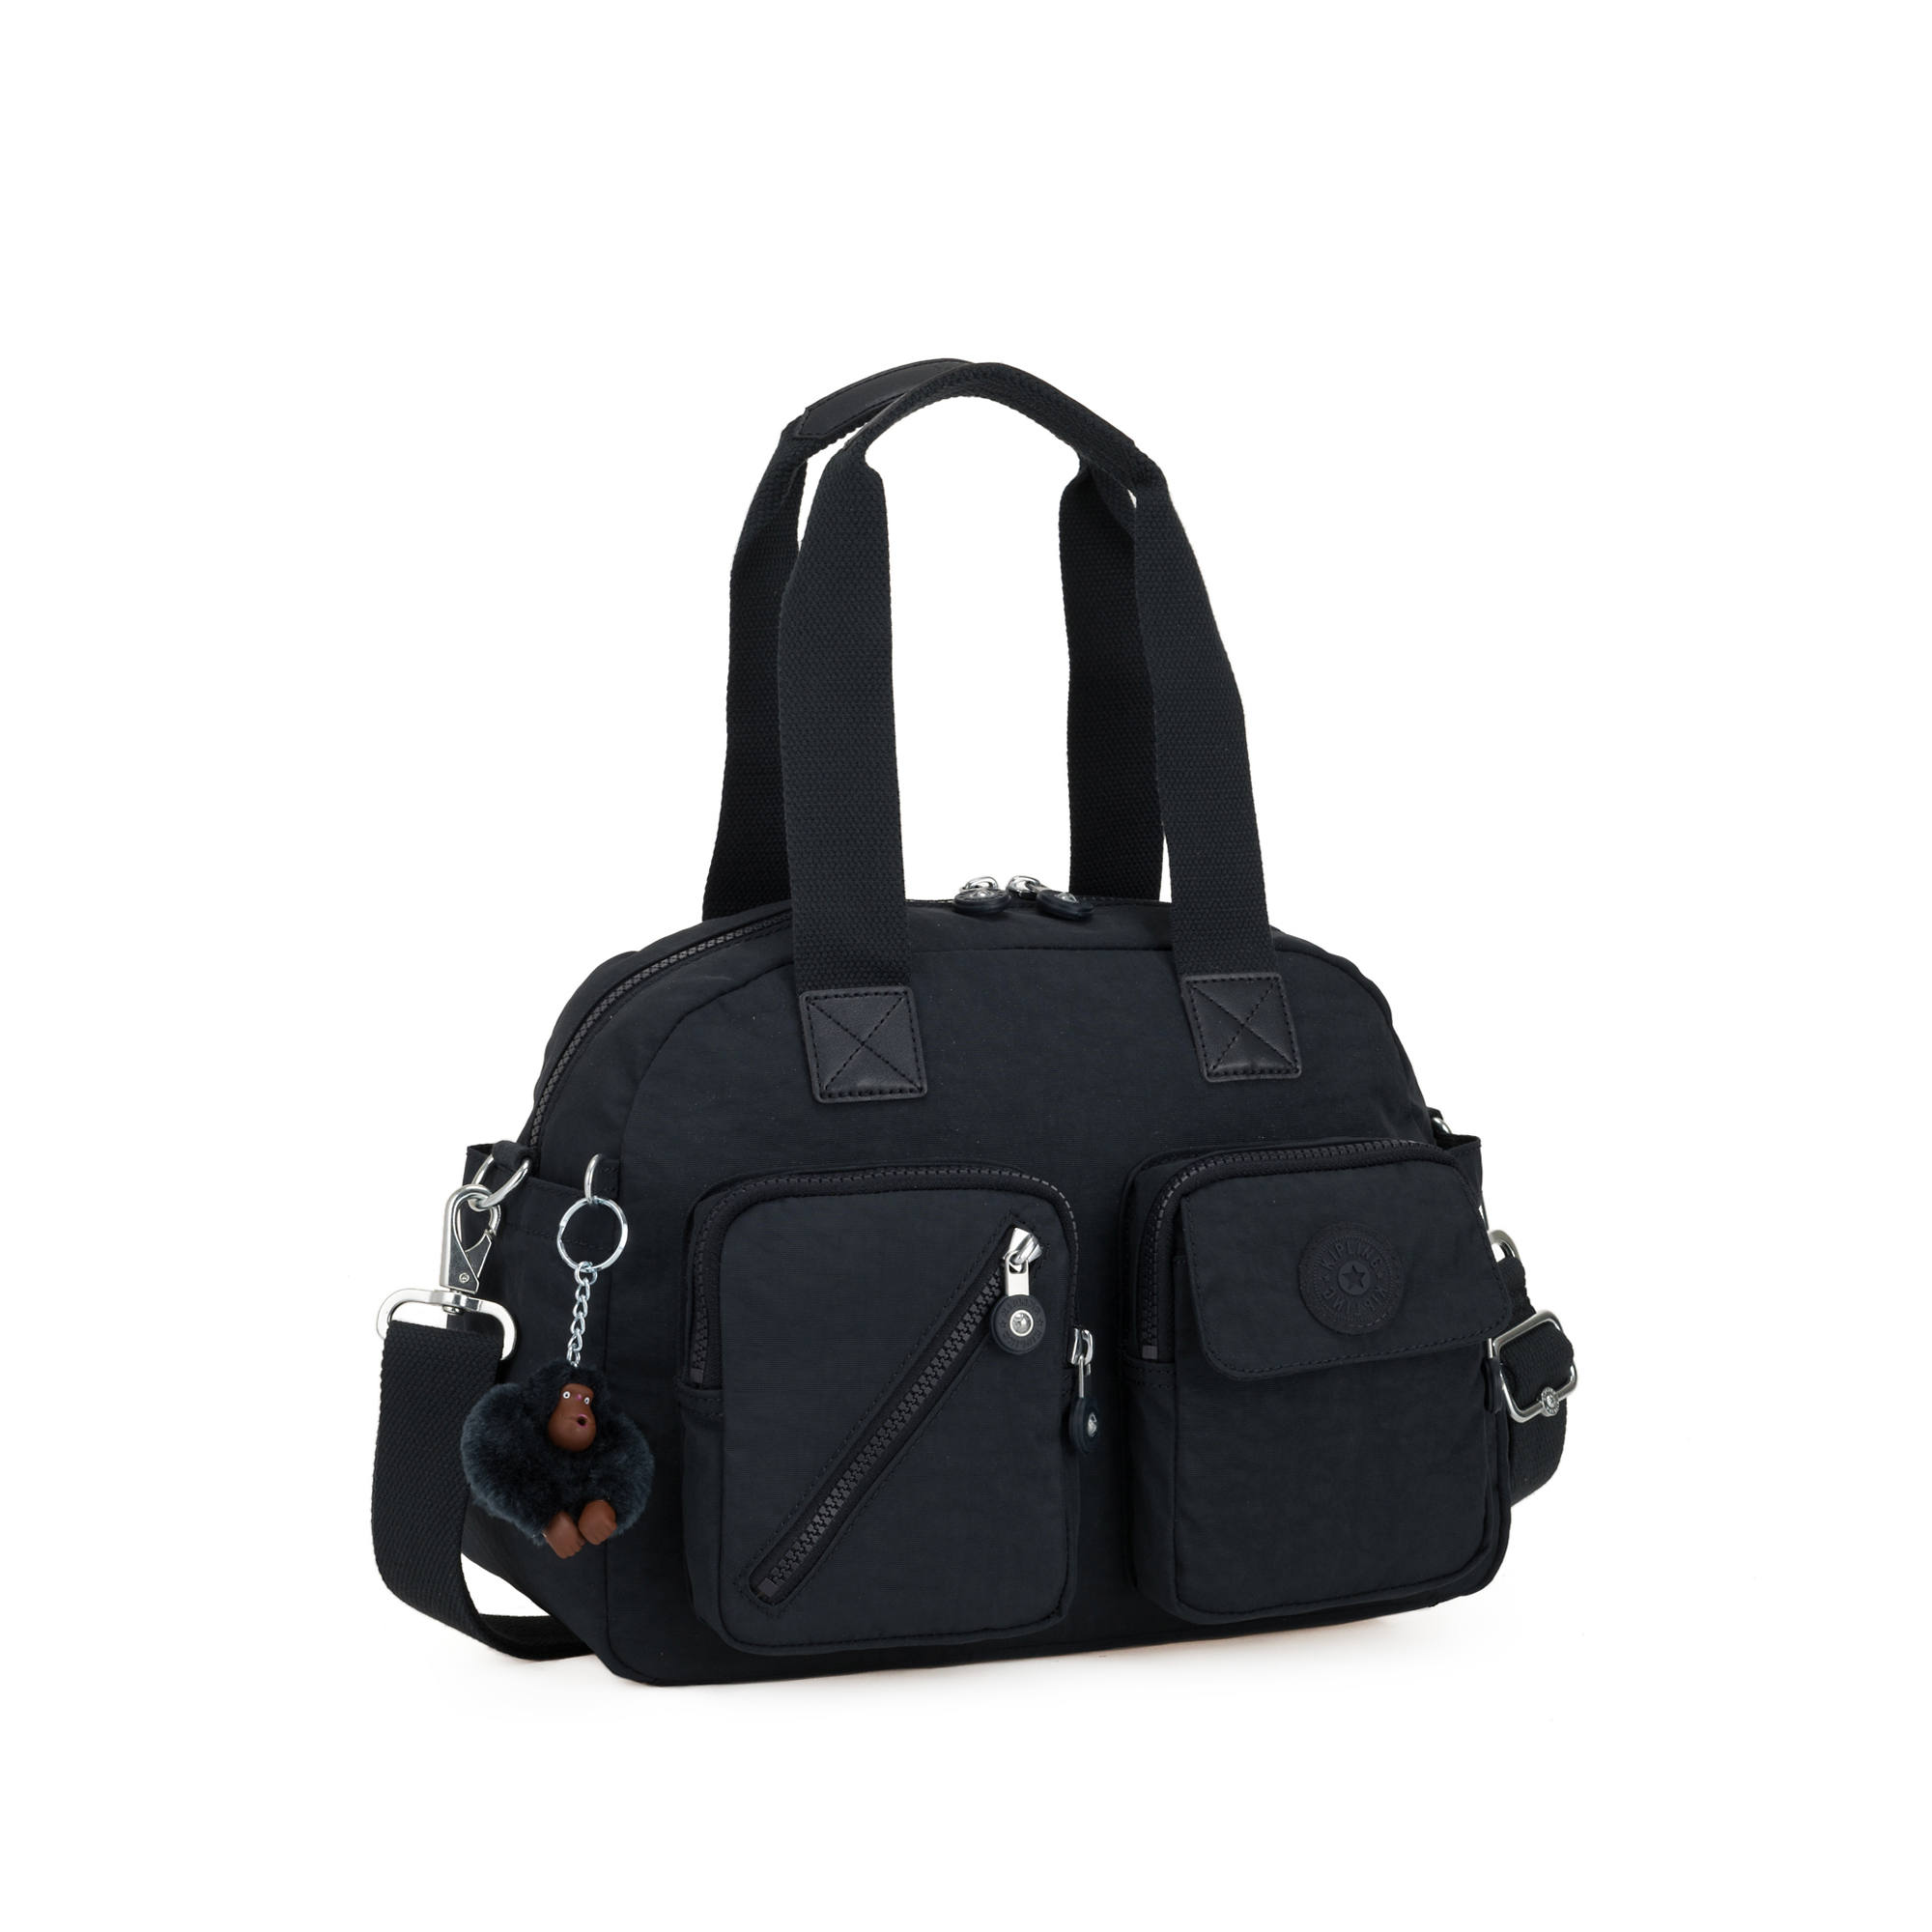 Kipling-Defea-Handbag miniatura 17